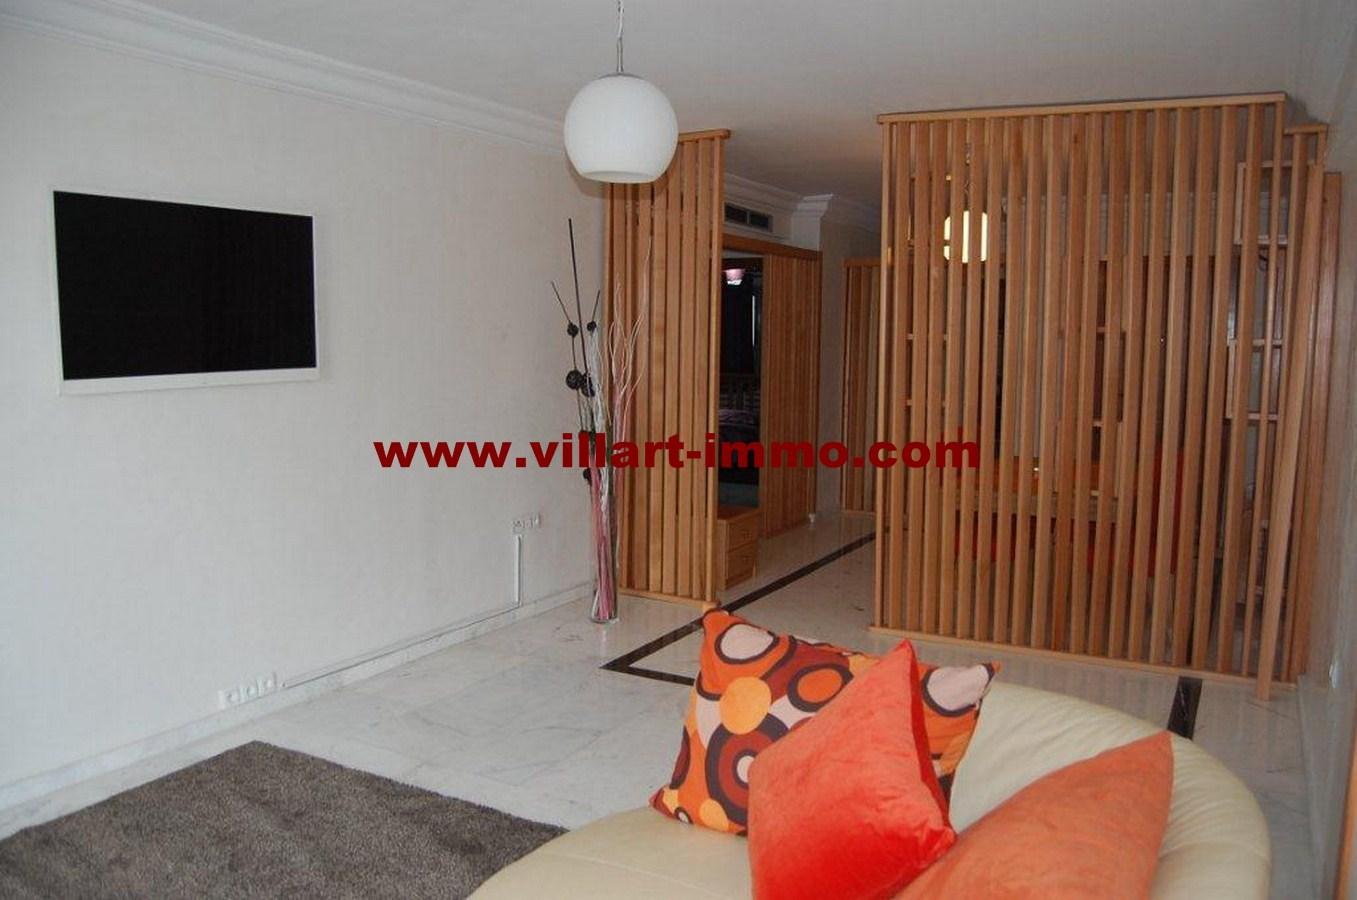 2-vente-appartement-tanger-centre-salon-2-va456-villart-immo